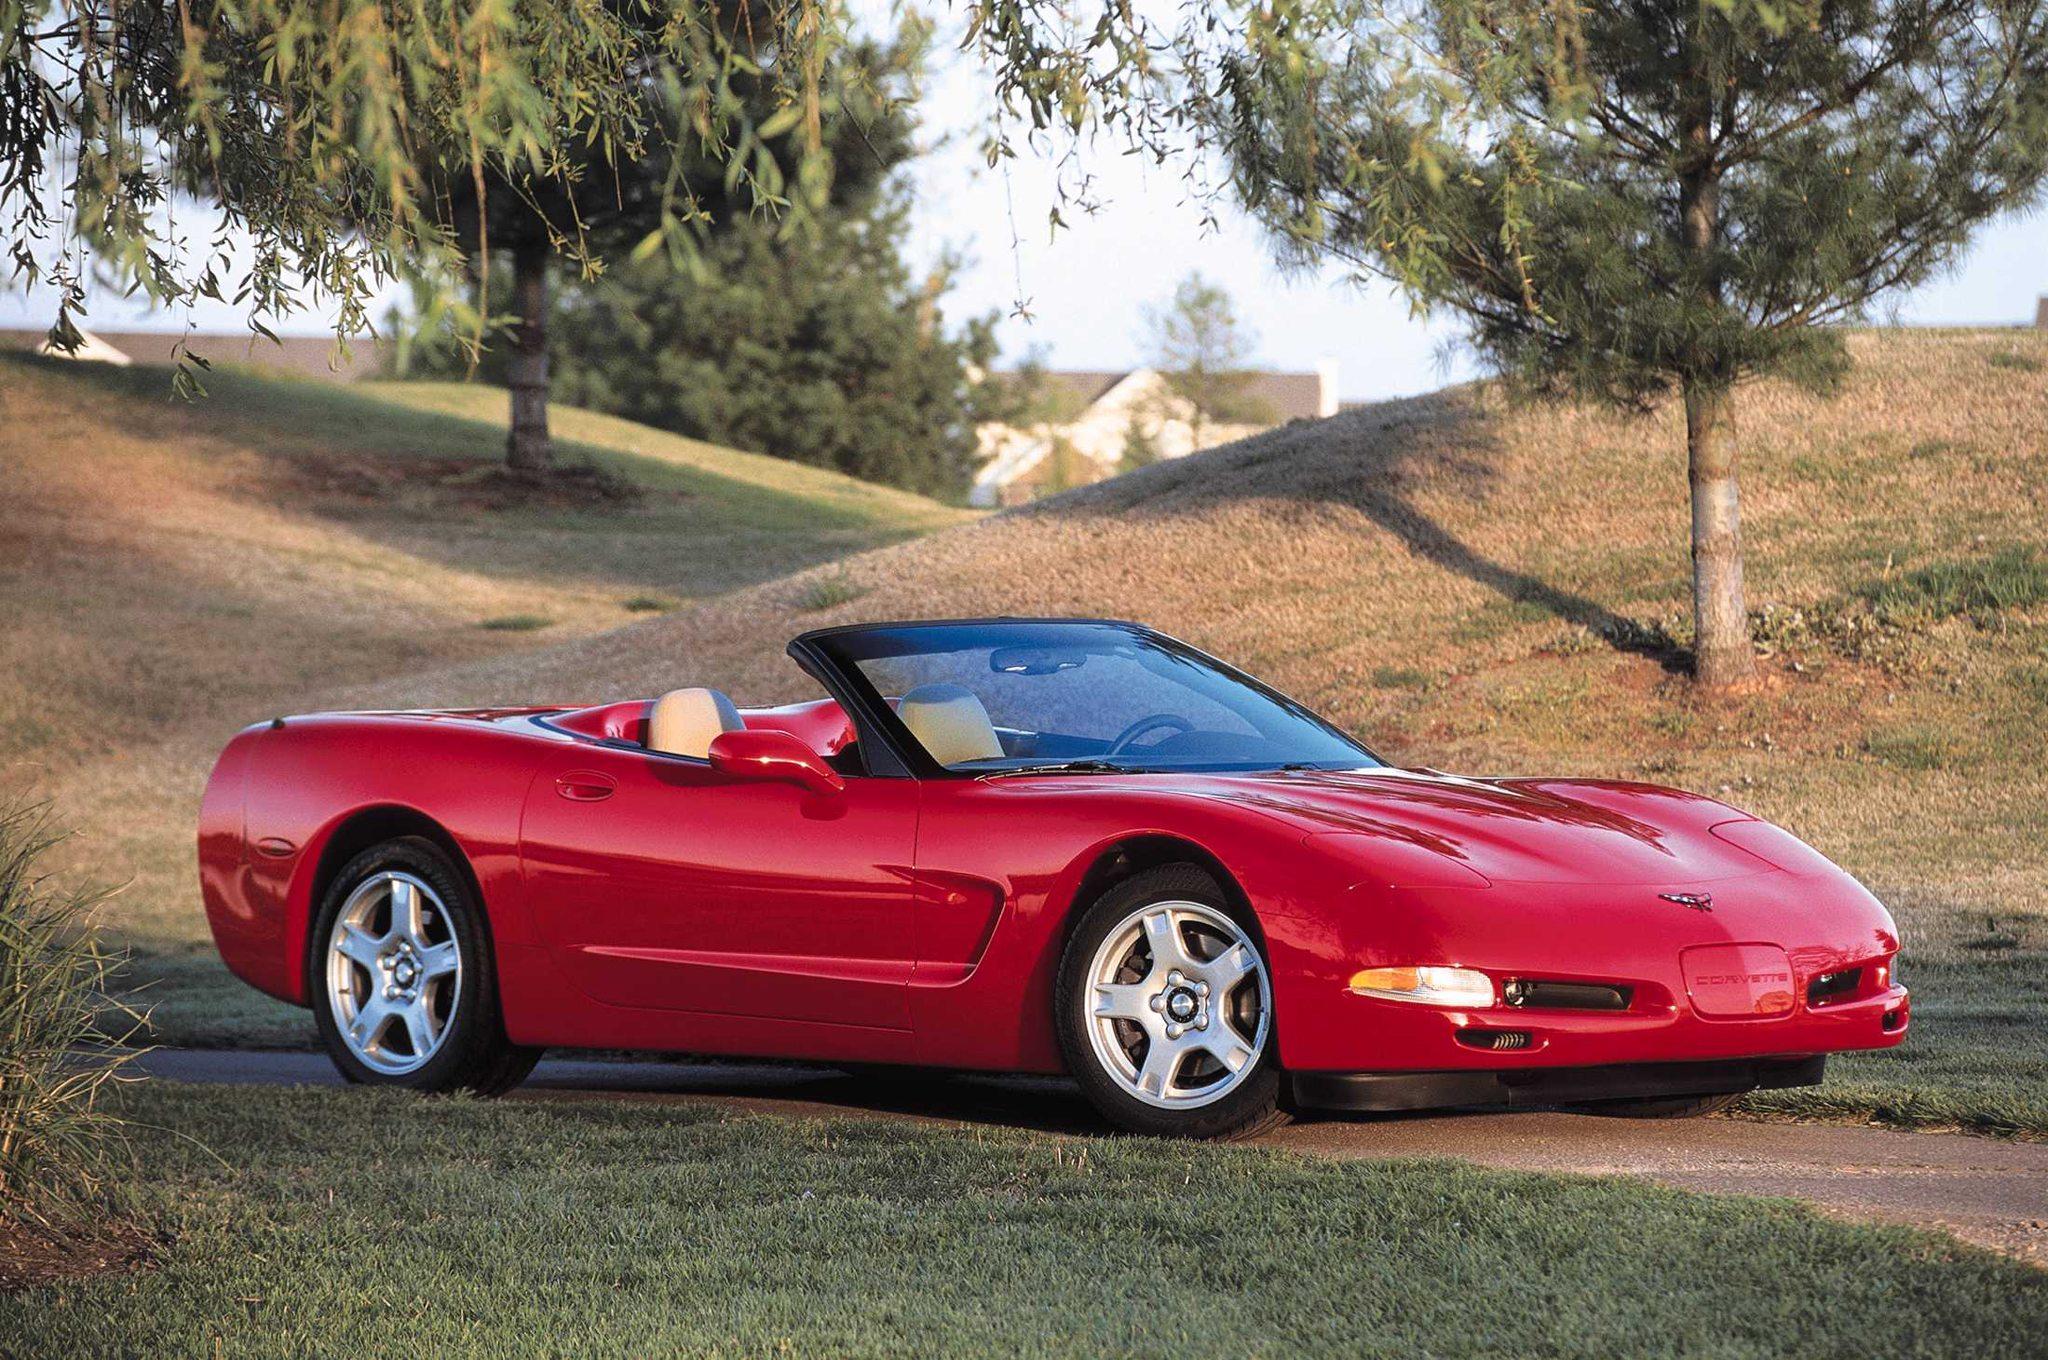 1998 c5 corvette image gallery pictures. Black Bedroom Furniture Sets. Home Design Ideas